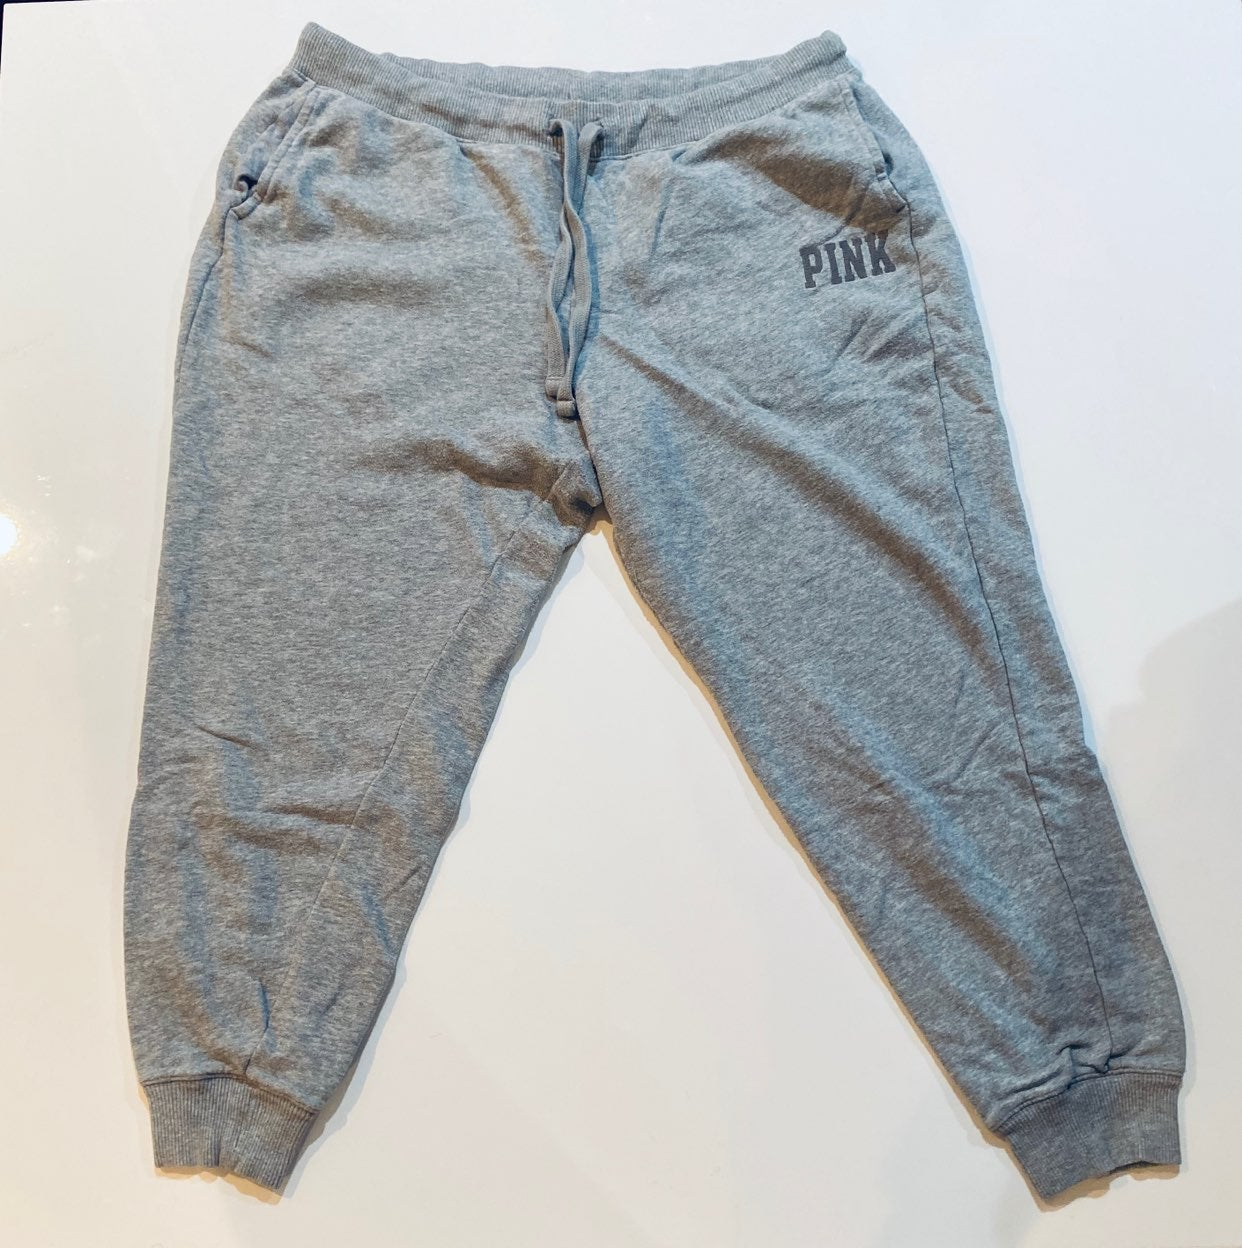 PINK Sweatpants Grey